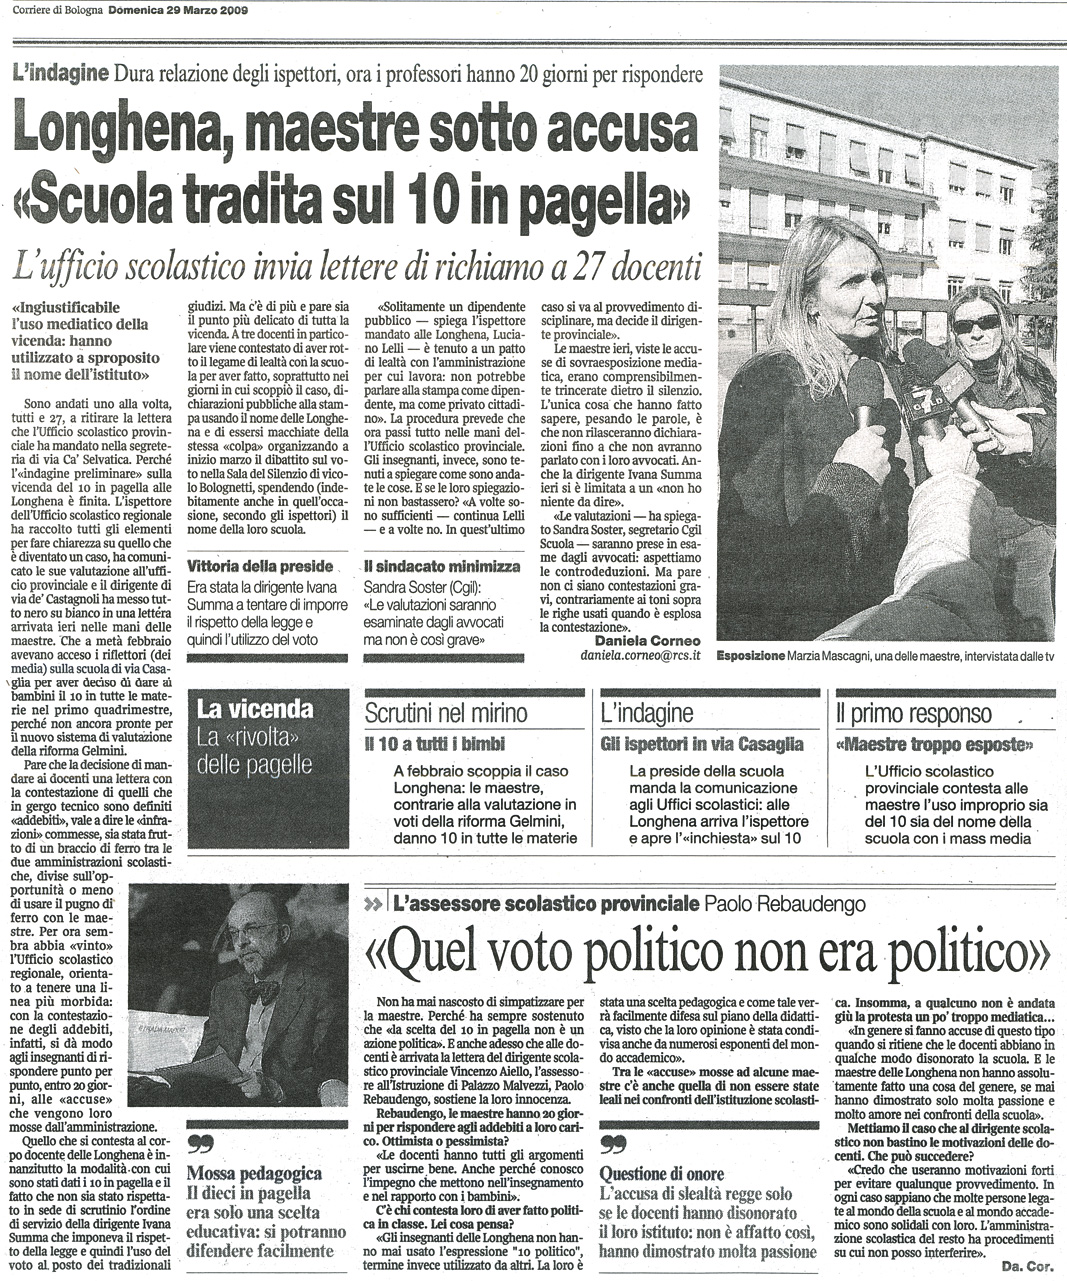 corriere-bologna-29032009